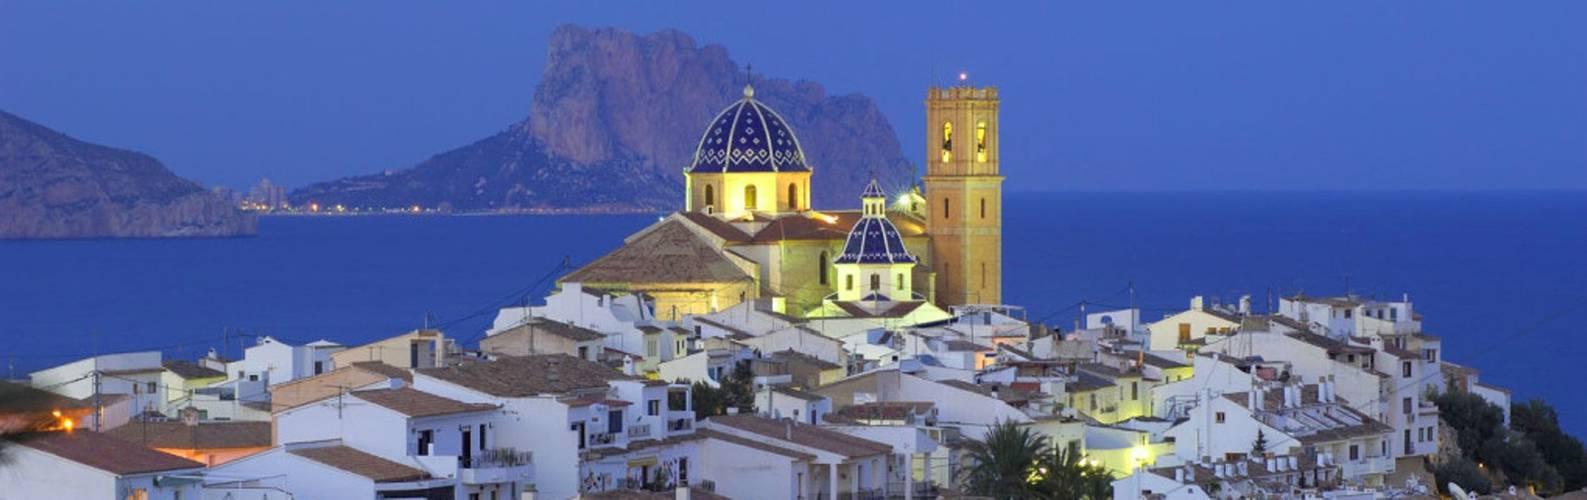 Hotel Hotel Cap Negret Altea, Alicante